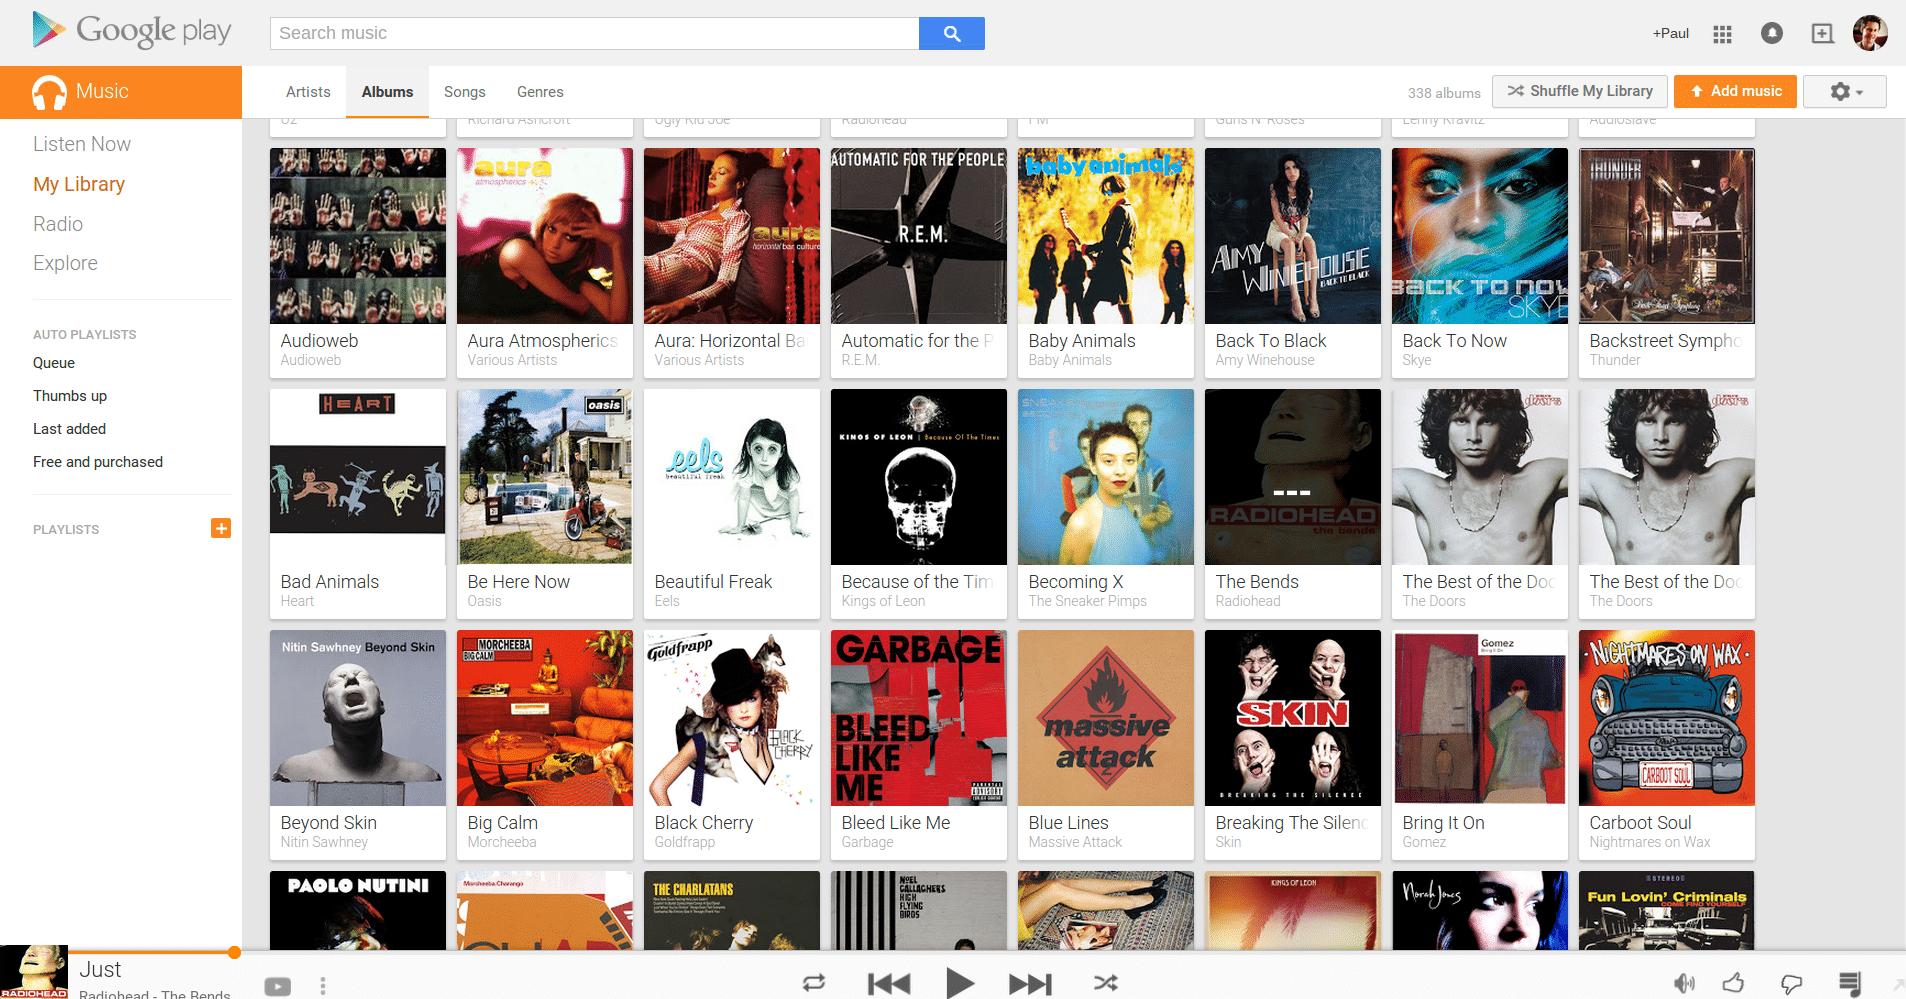 Google Play Music albums